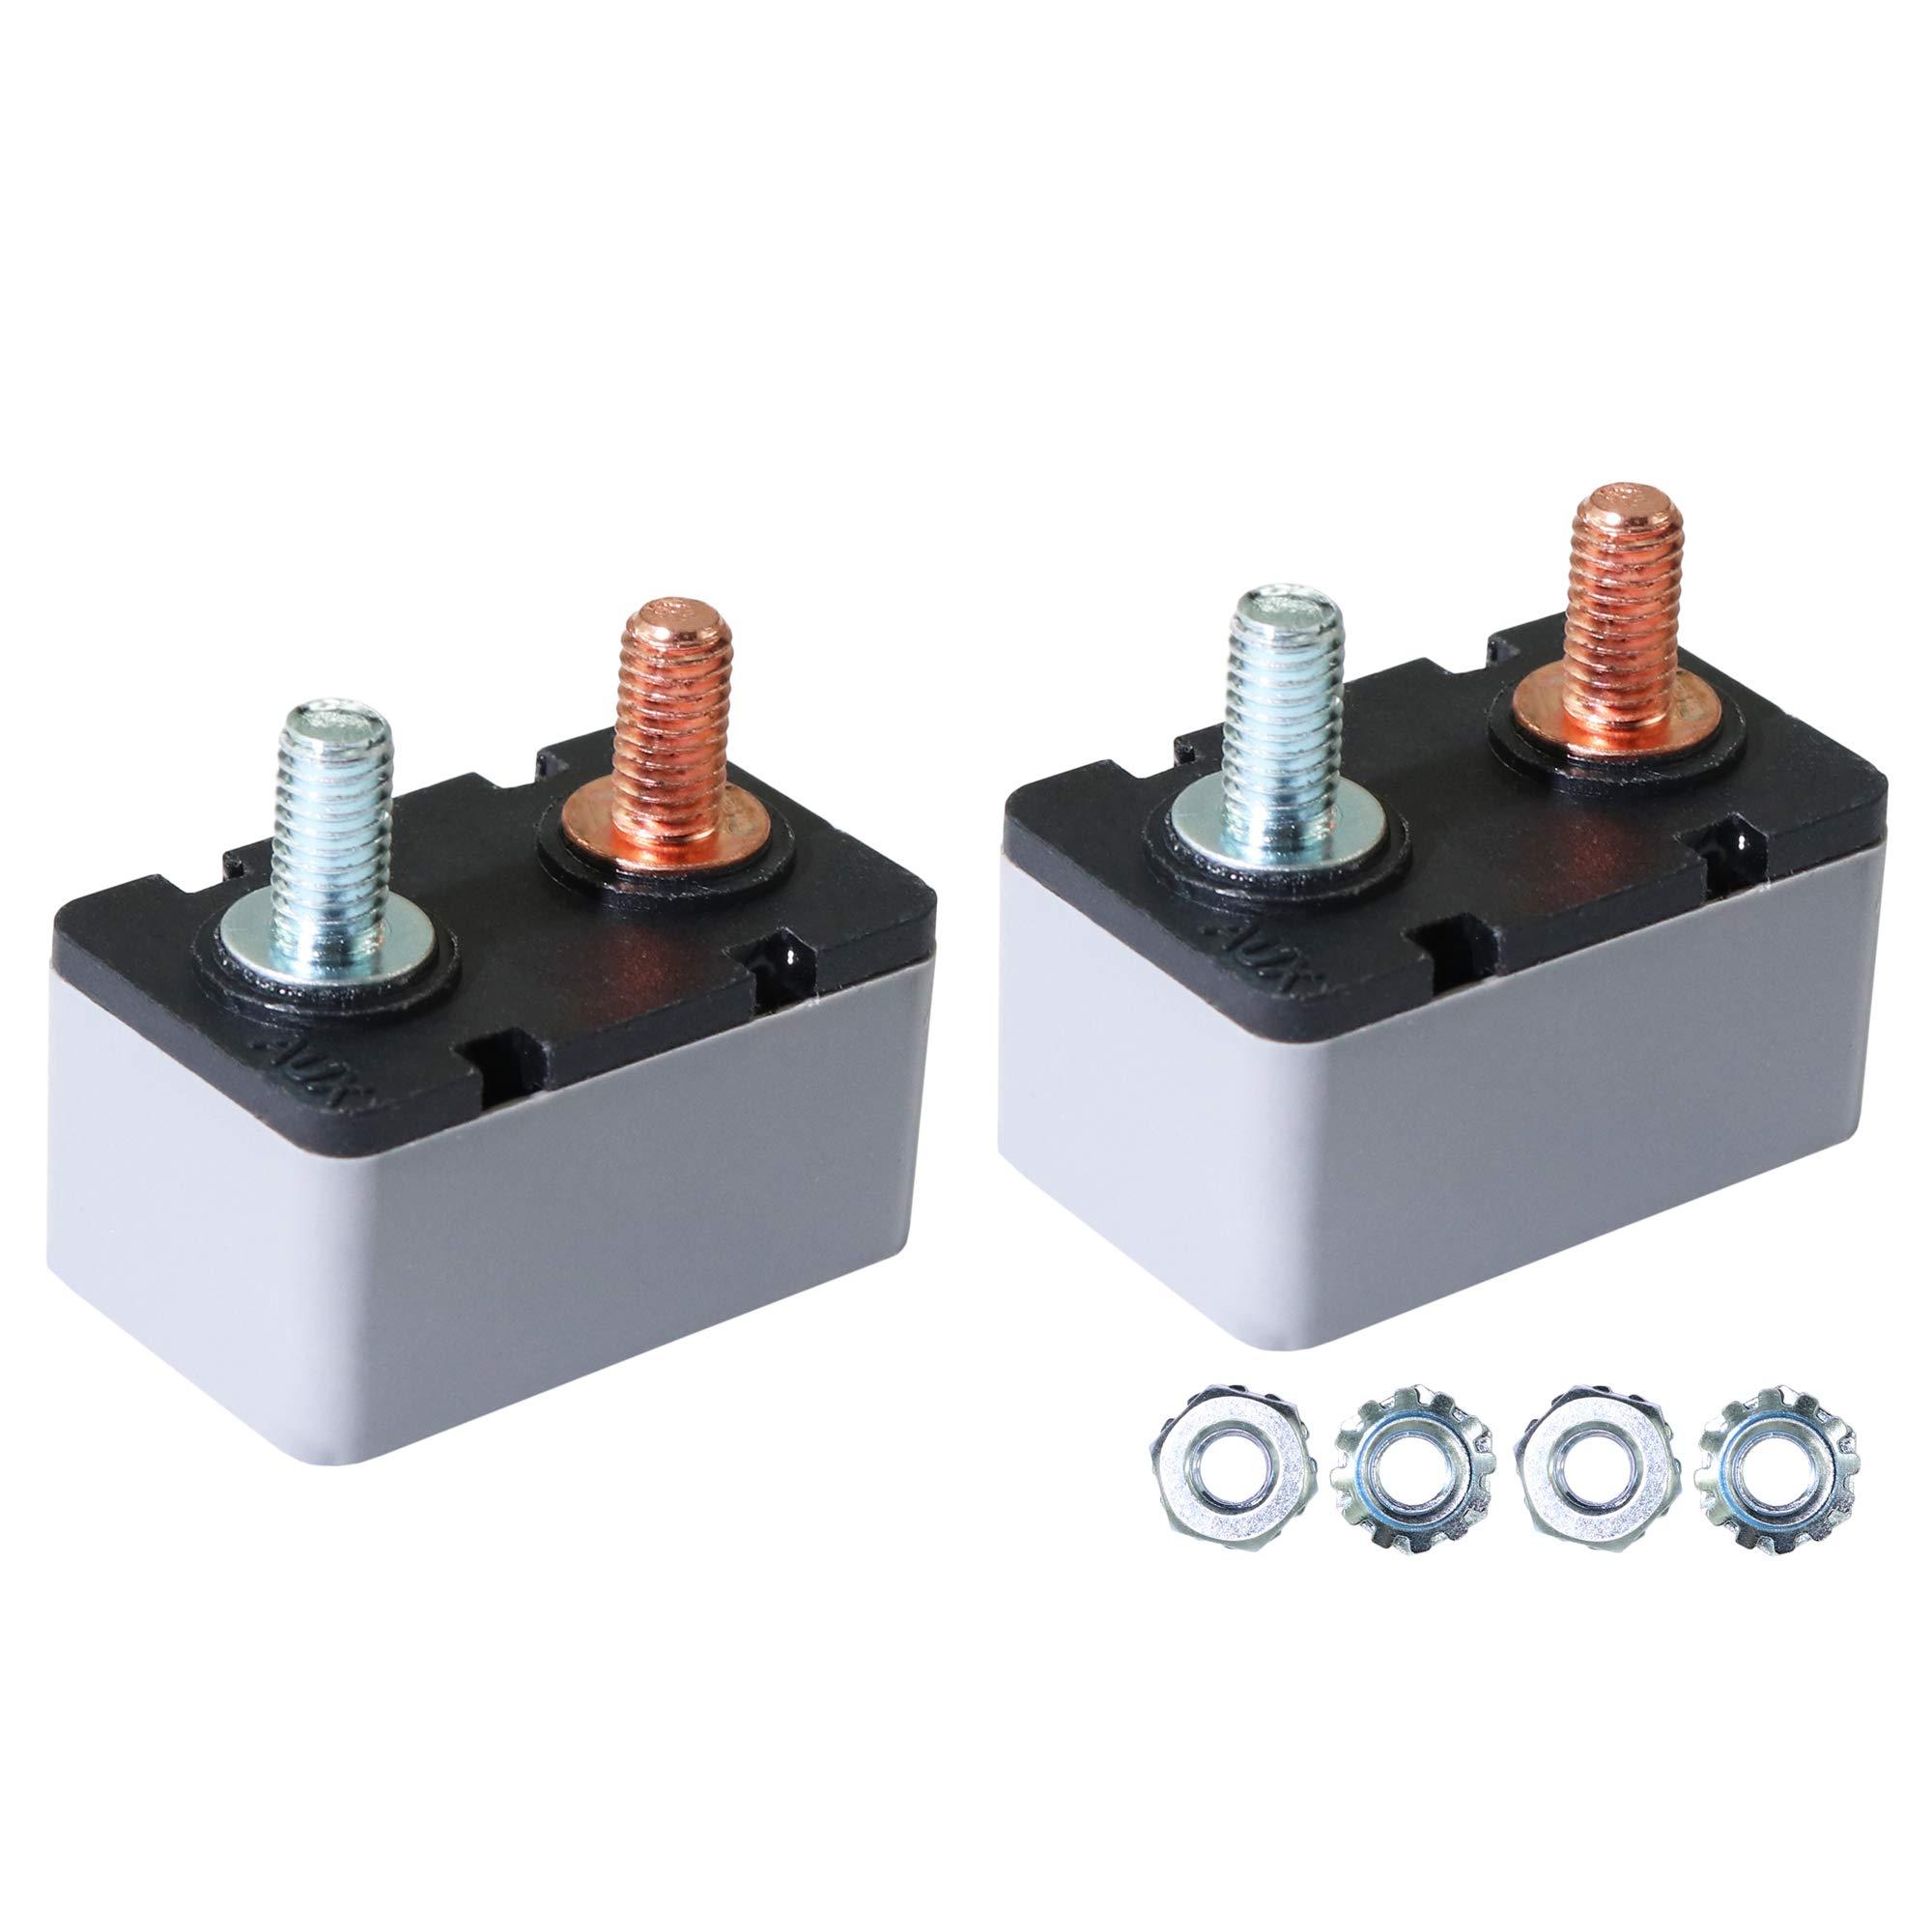 2PCS 12-24V 50 Amp ATV Resettable Circuit Breaker Fuse holder Metal Stud Bolt 50A